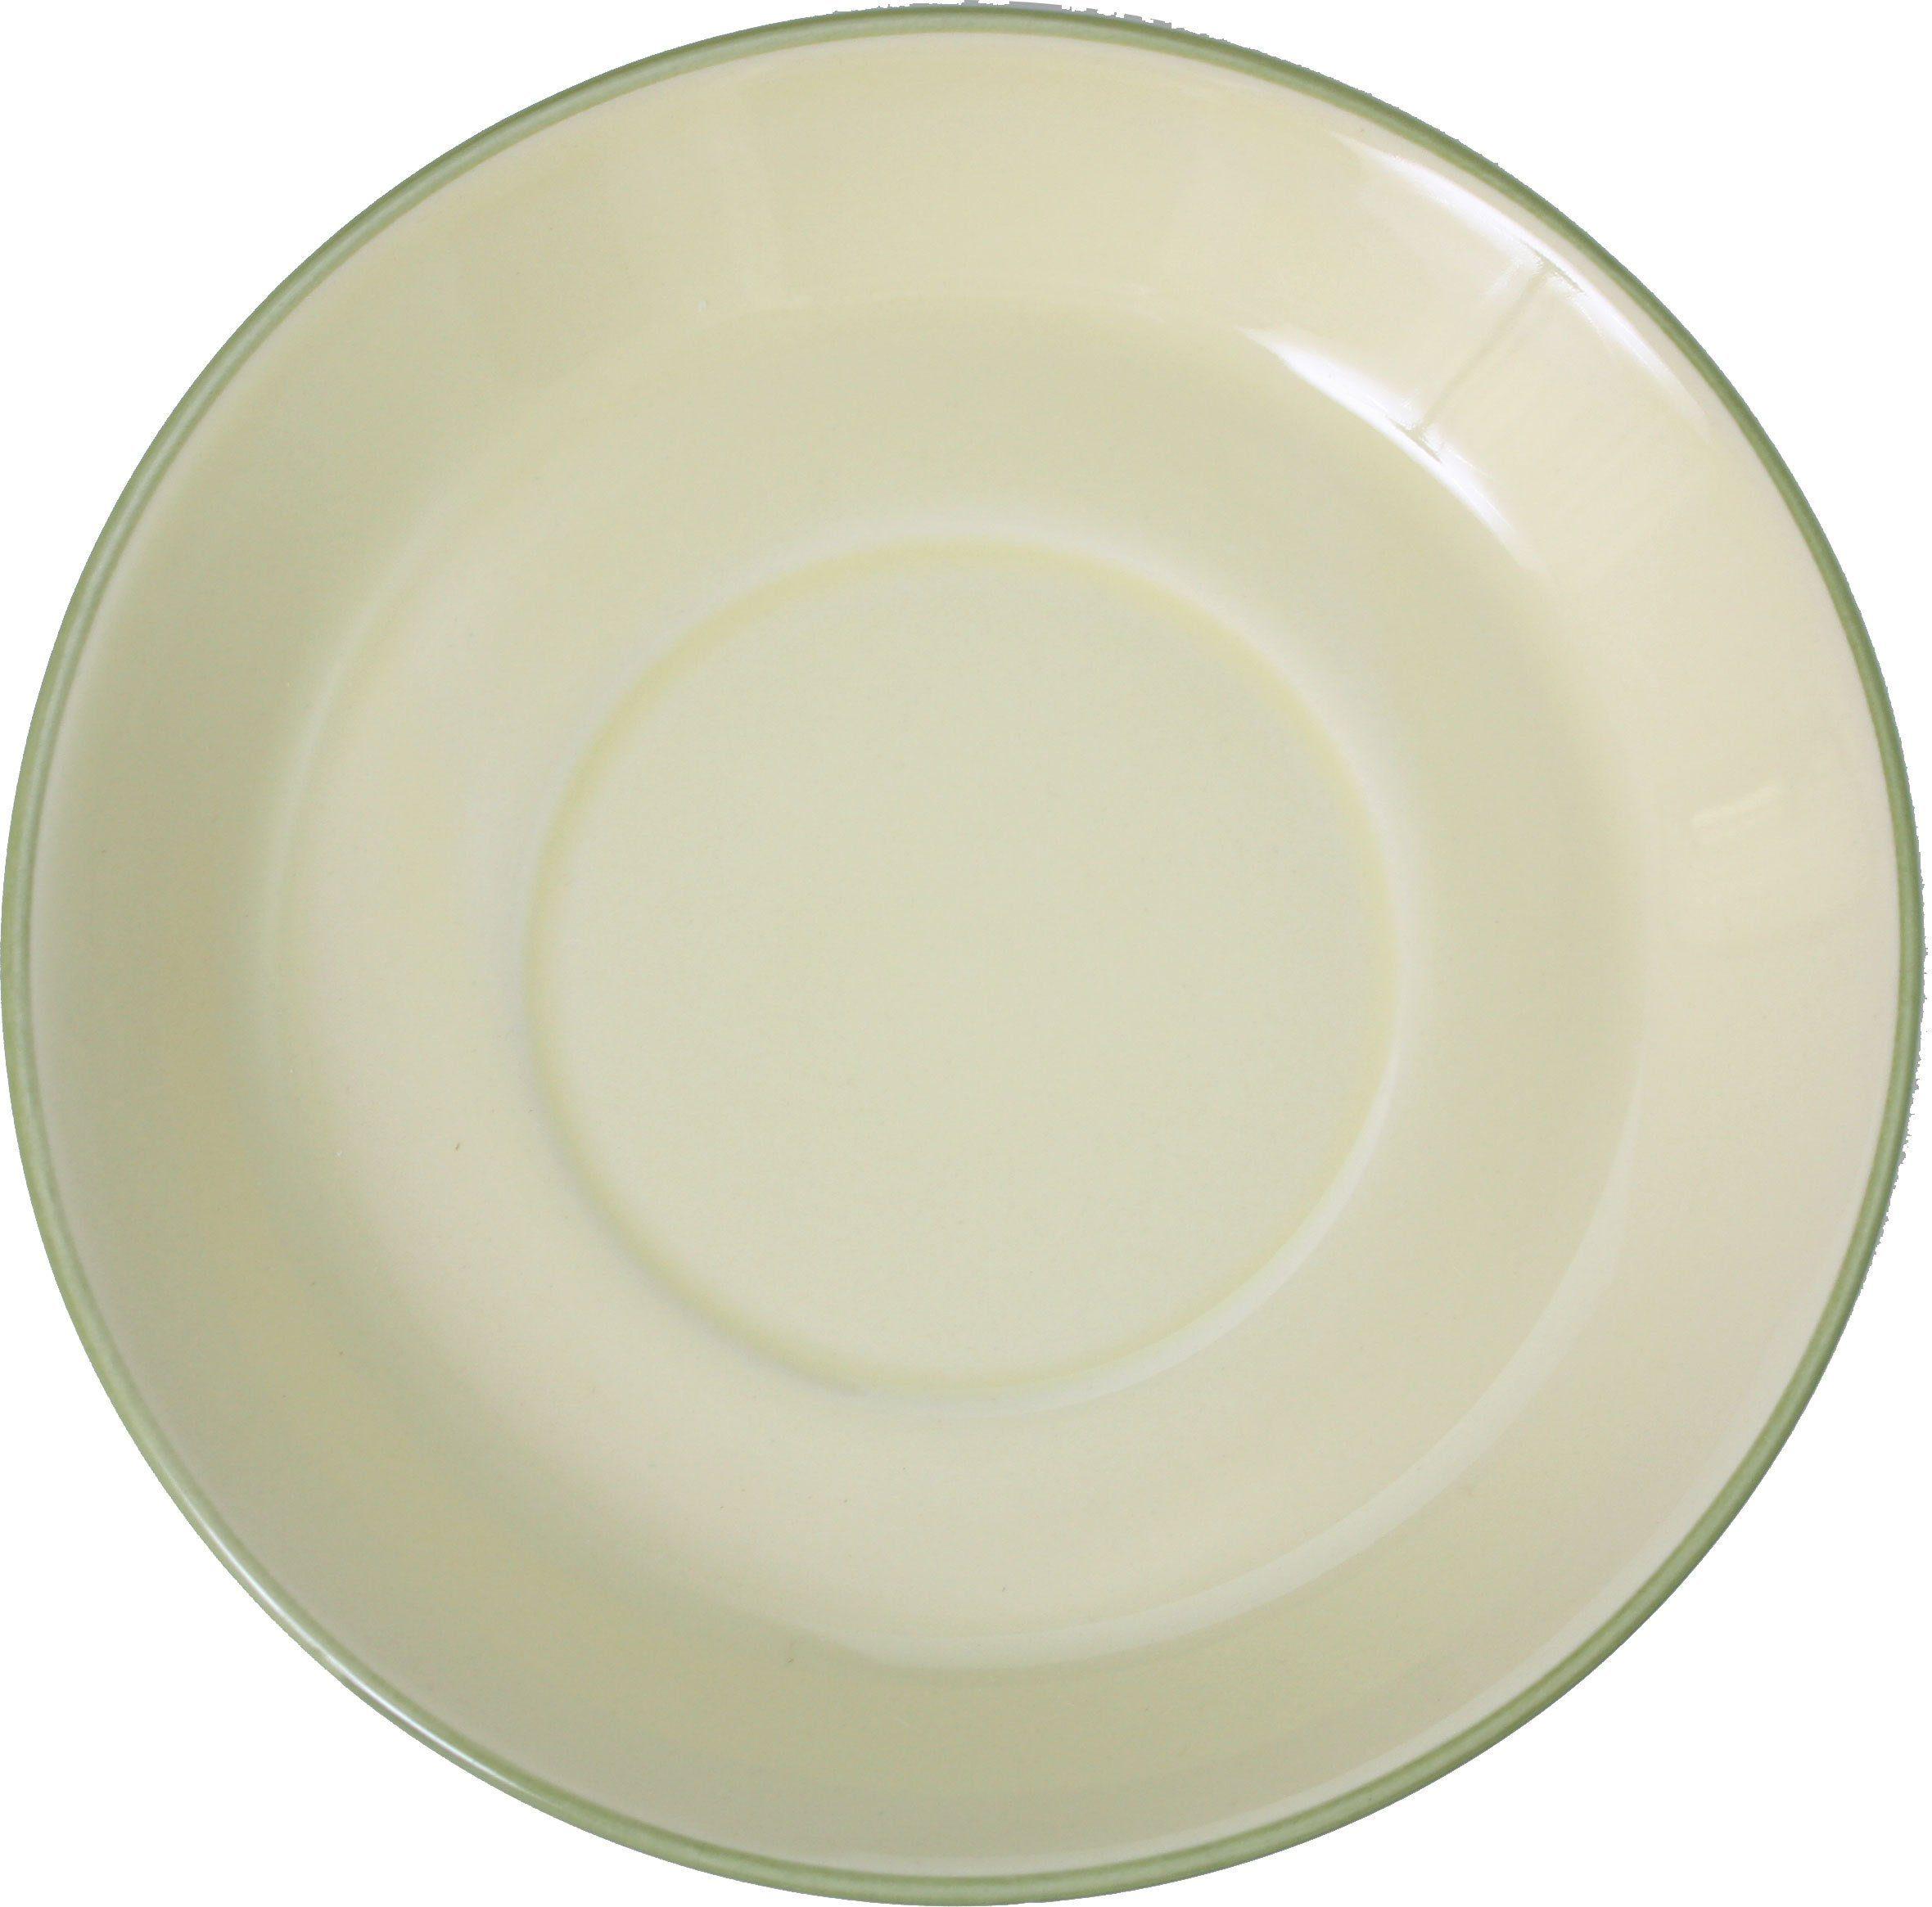 Zeller Keramik Untertasse »Biene«